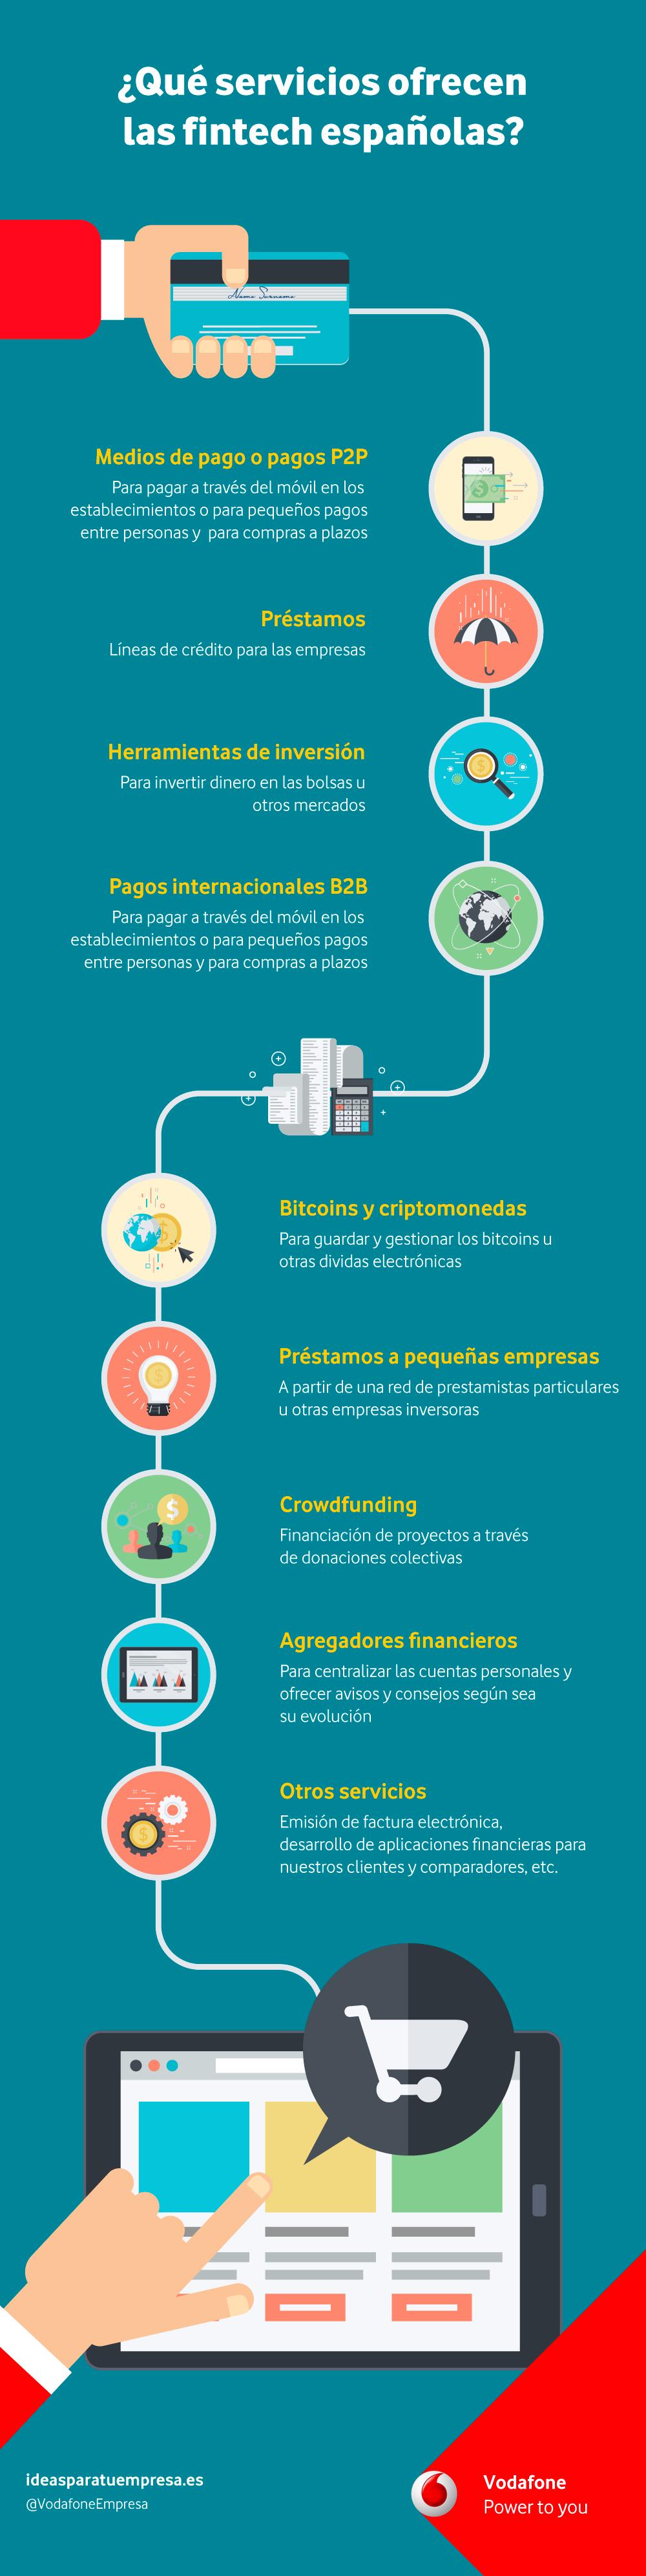 Qué servicios ofrecen las fintech españolas #infografia #infographic